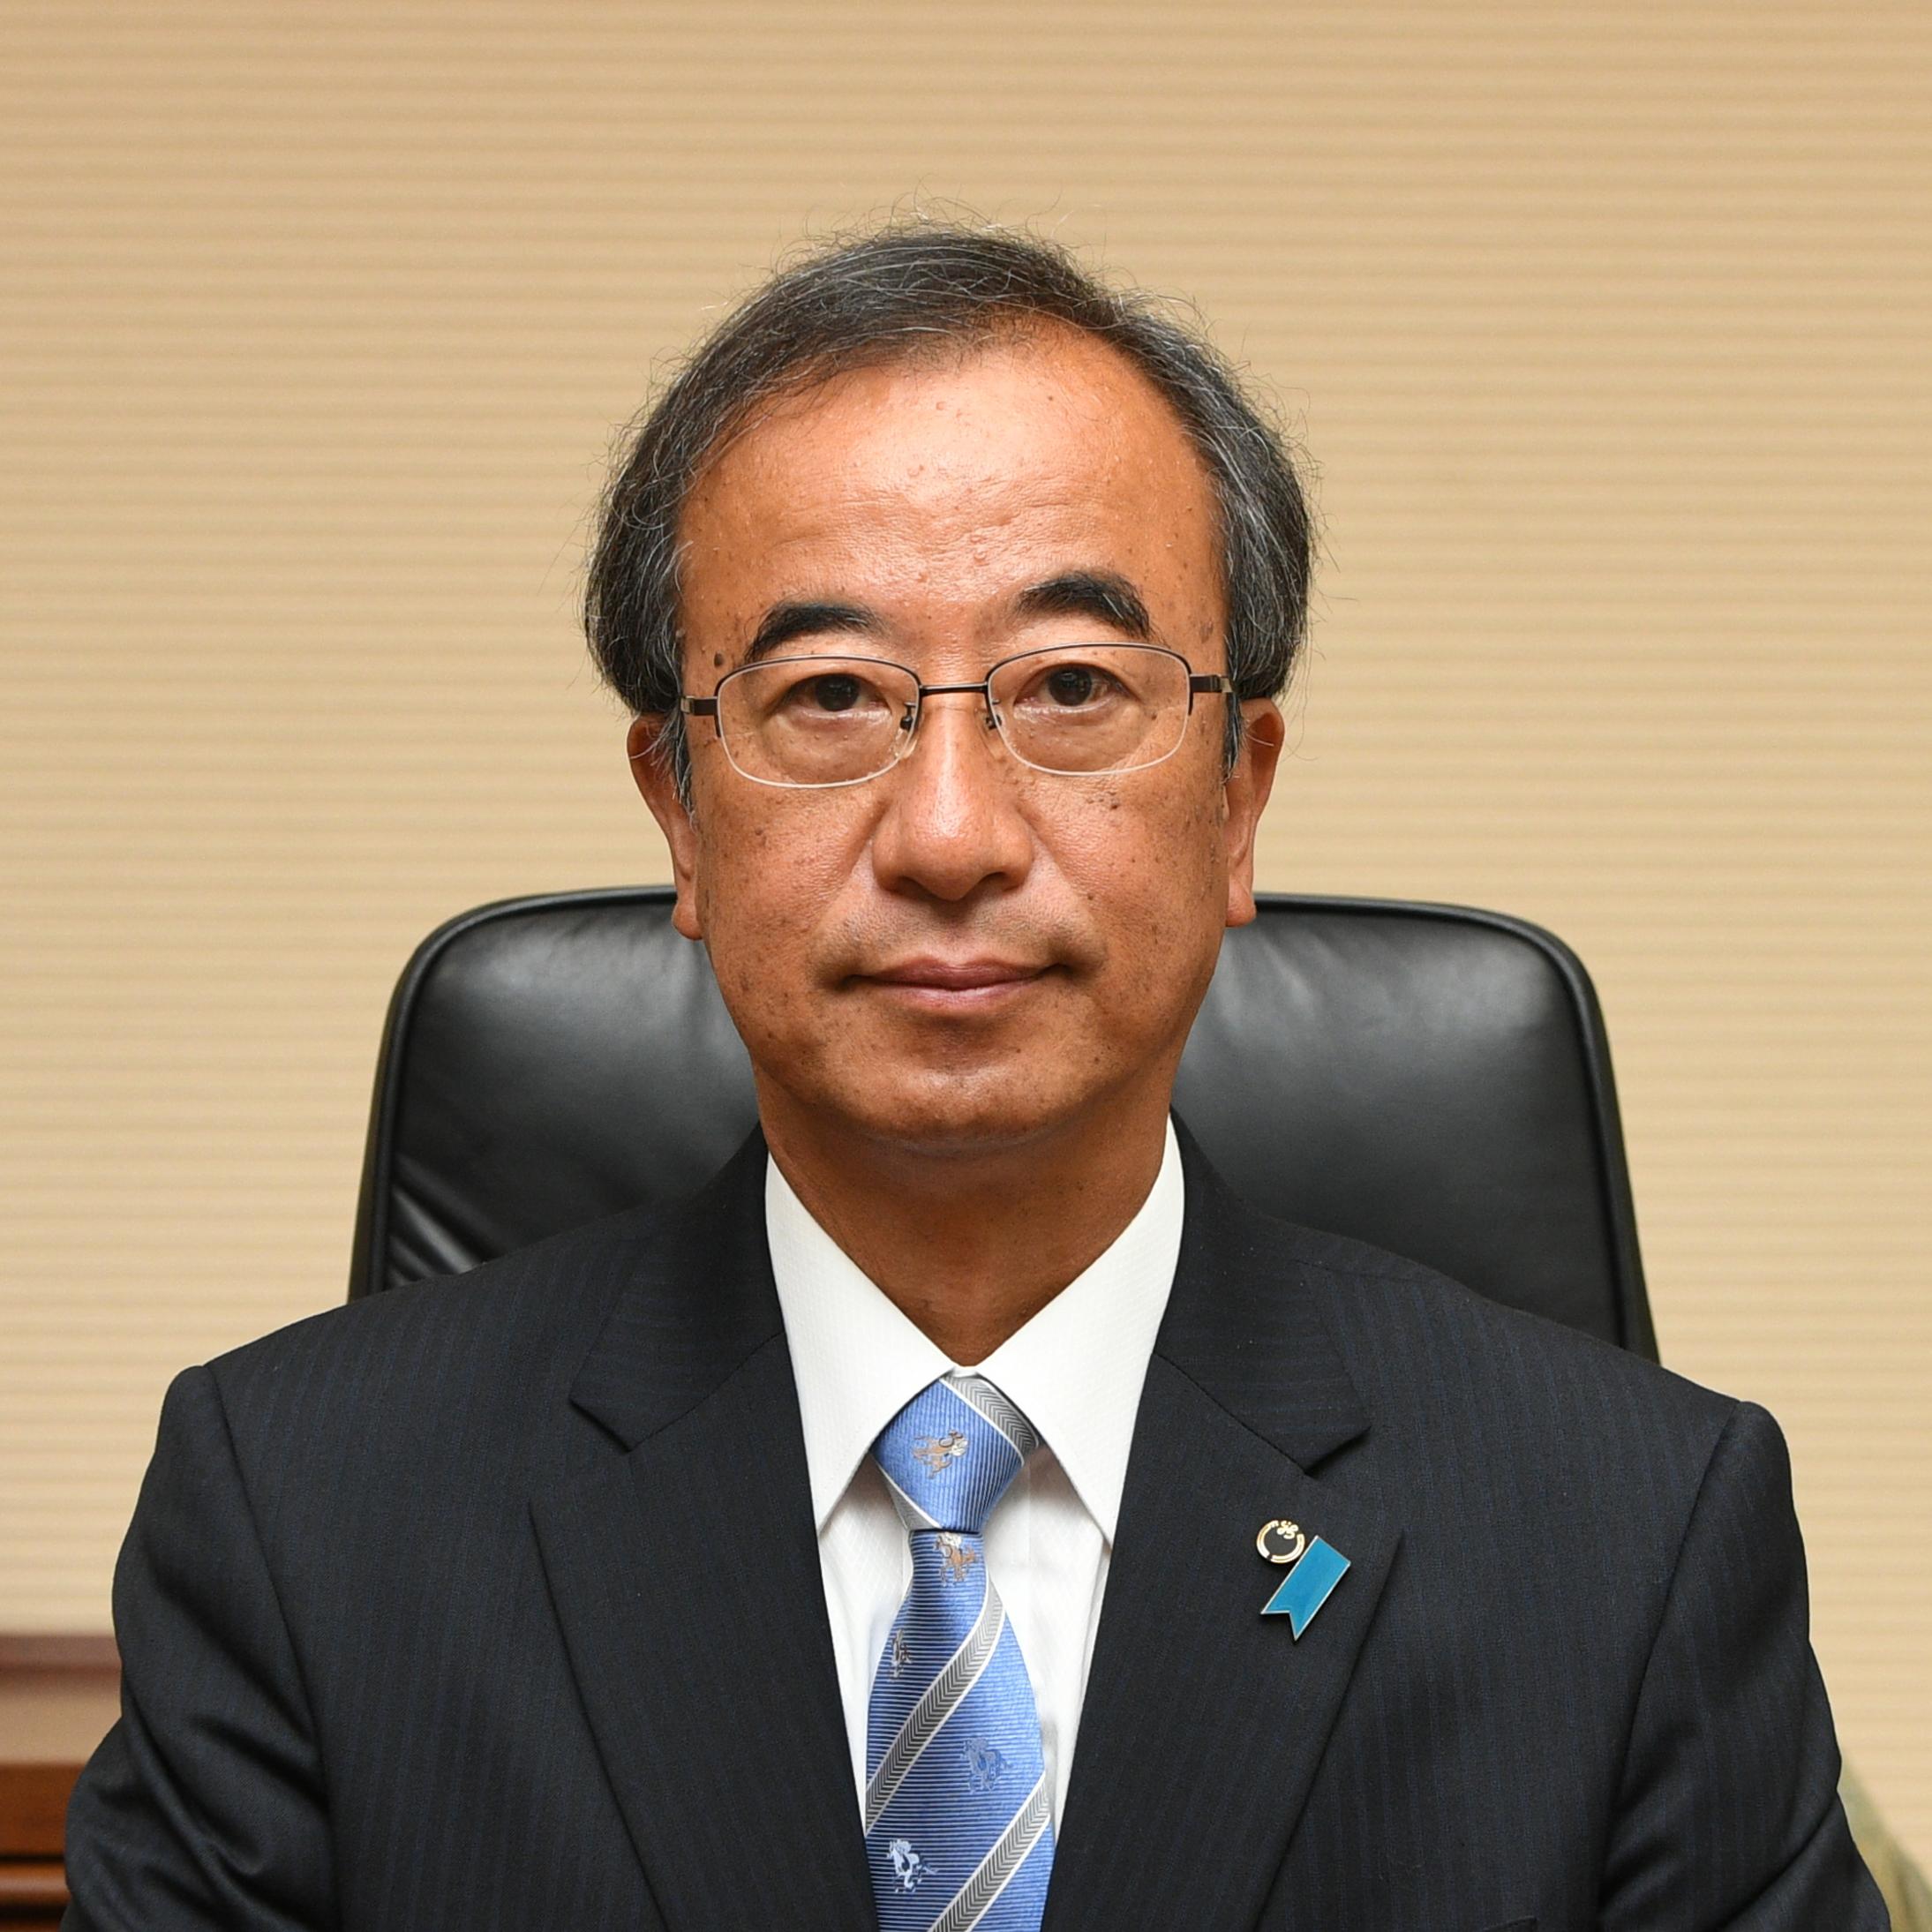 Hideyo Hanazumi, Governor of Niigata Prefecture